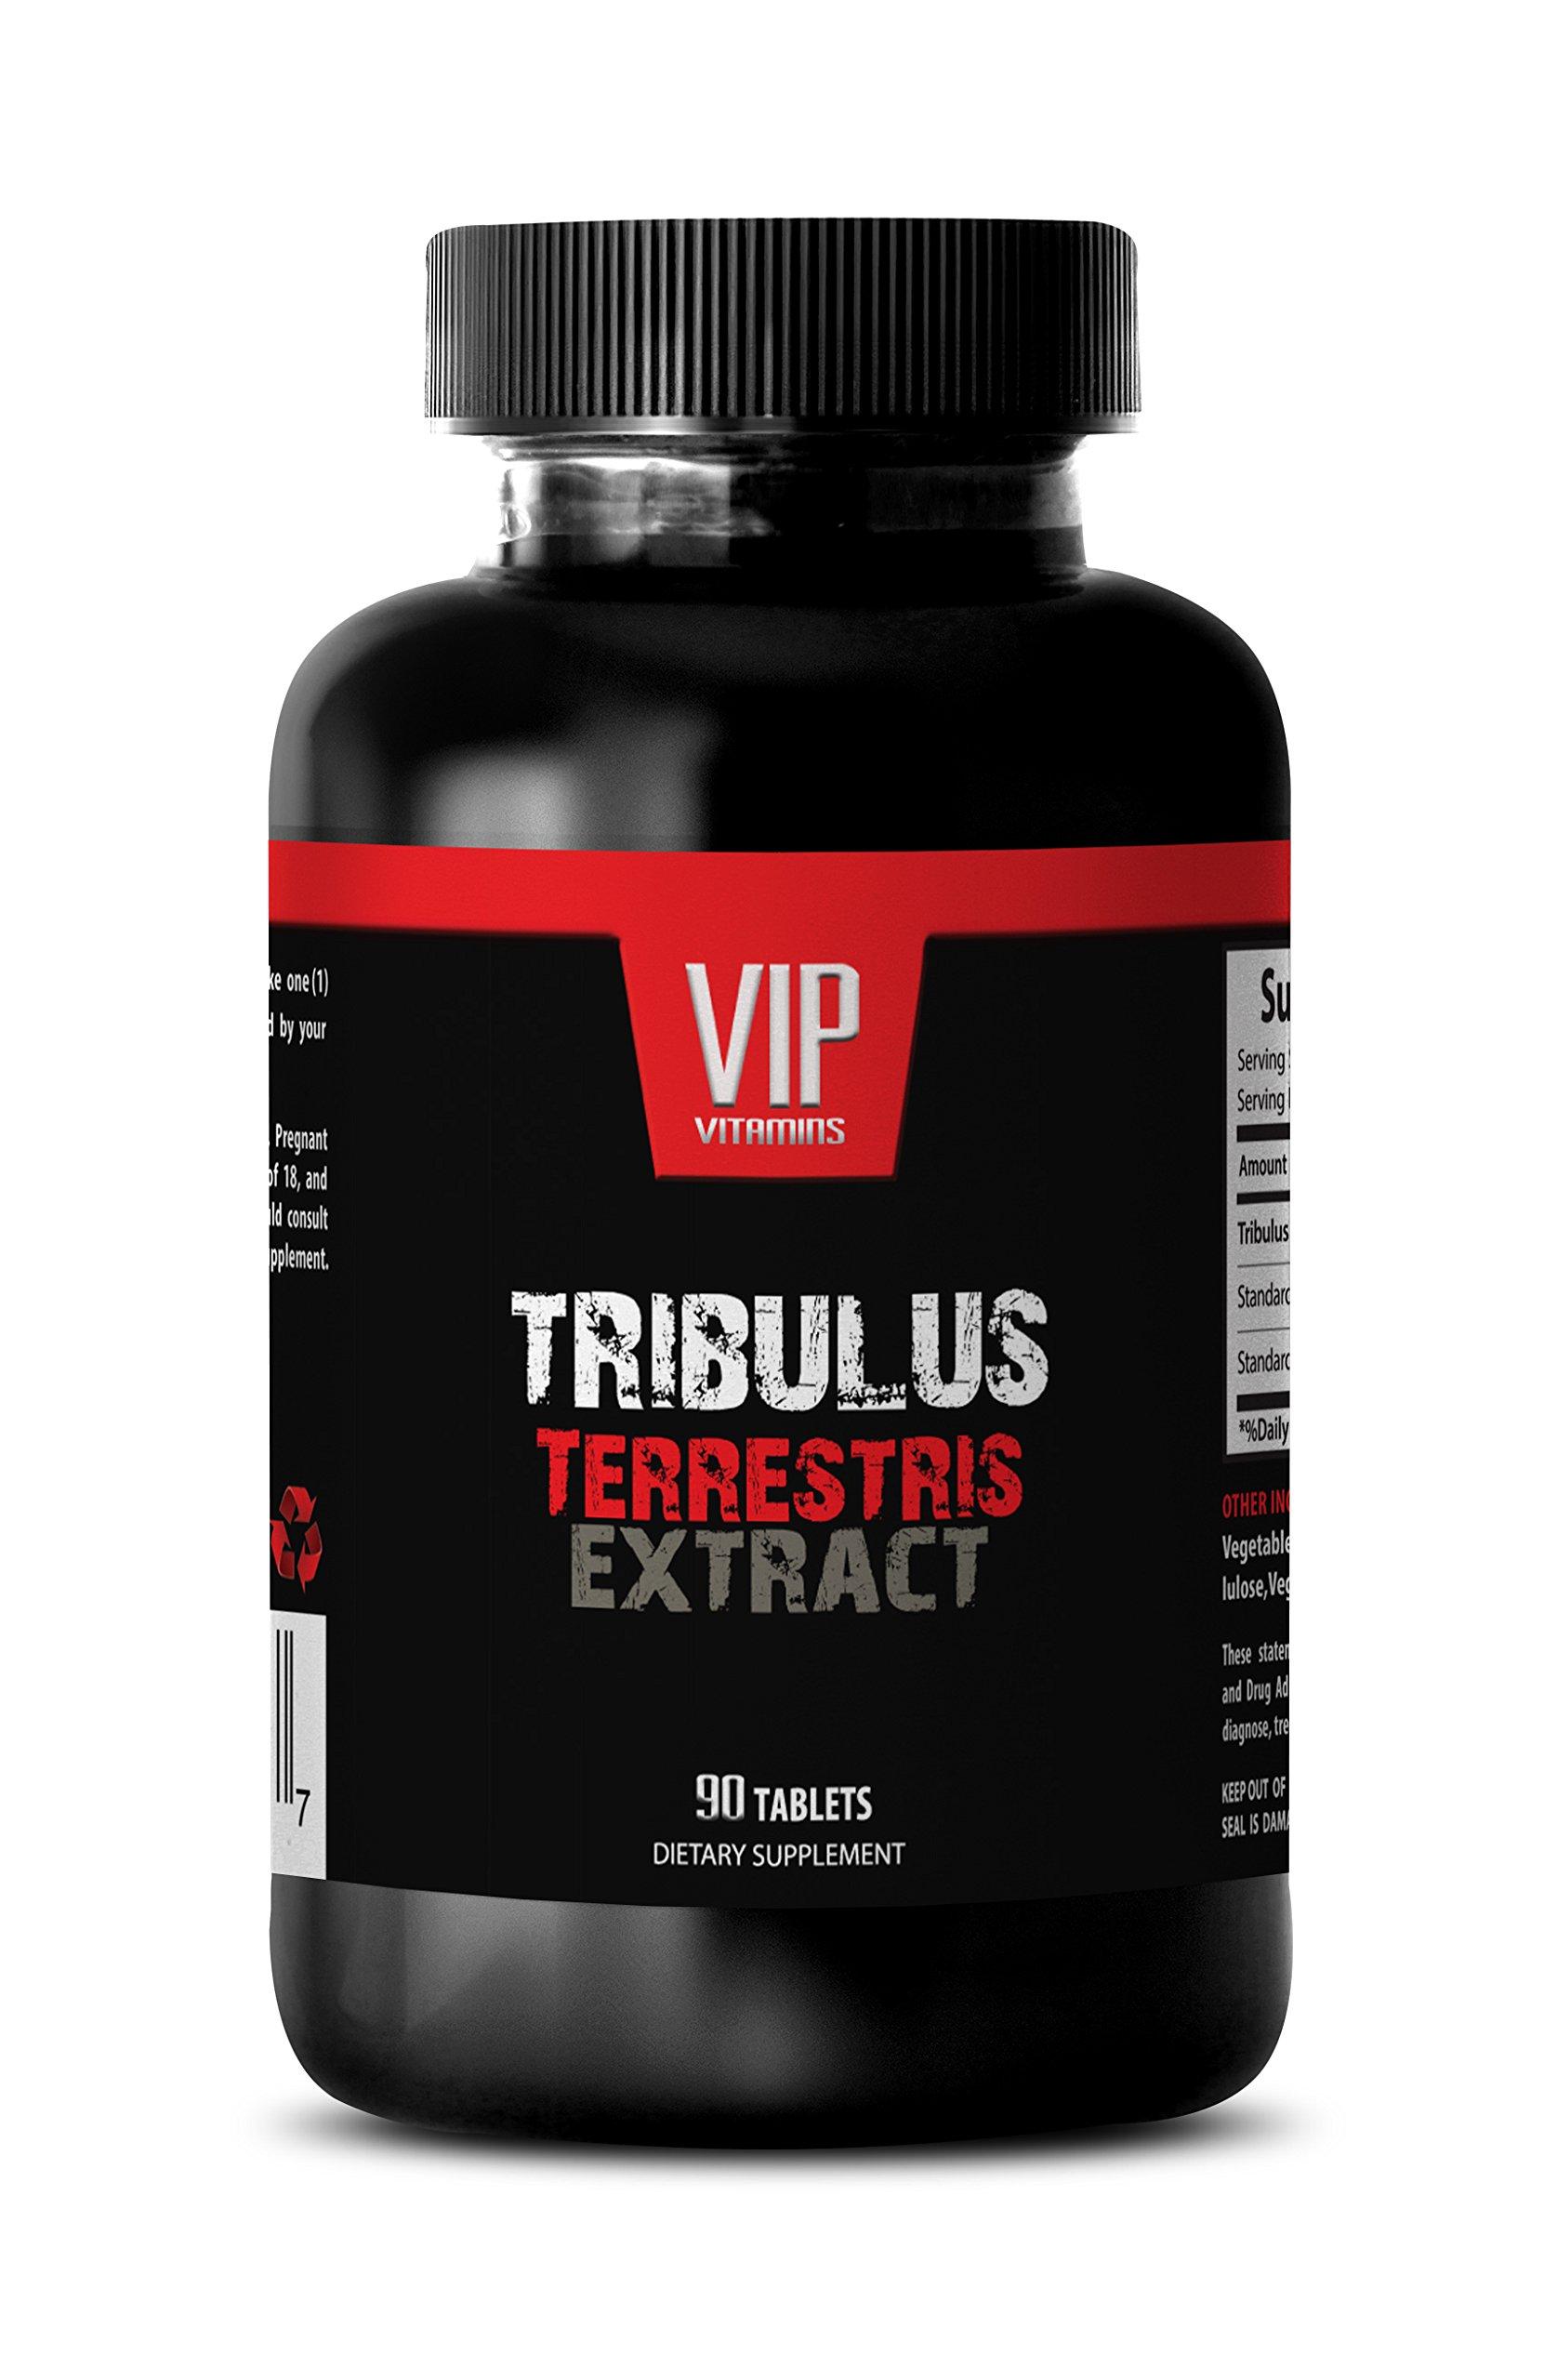 Sex boost men - TRIBULUS TERRESTRIS PREMIUM EXTRACT 1000mg - Tribulus strength testosterone booster - 1 Bottle 90 Tablets